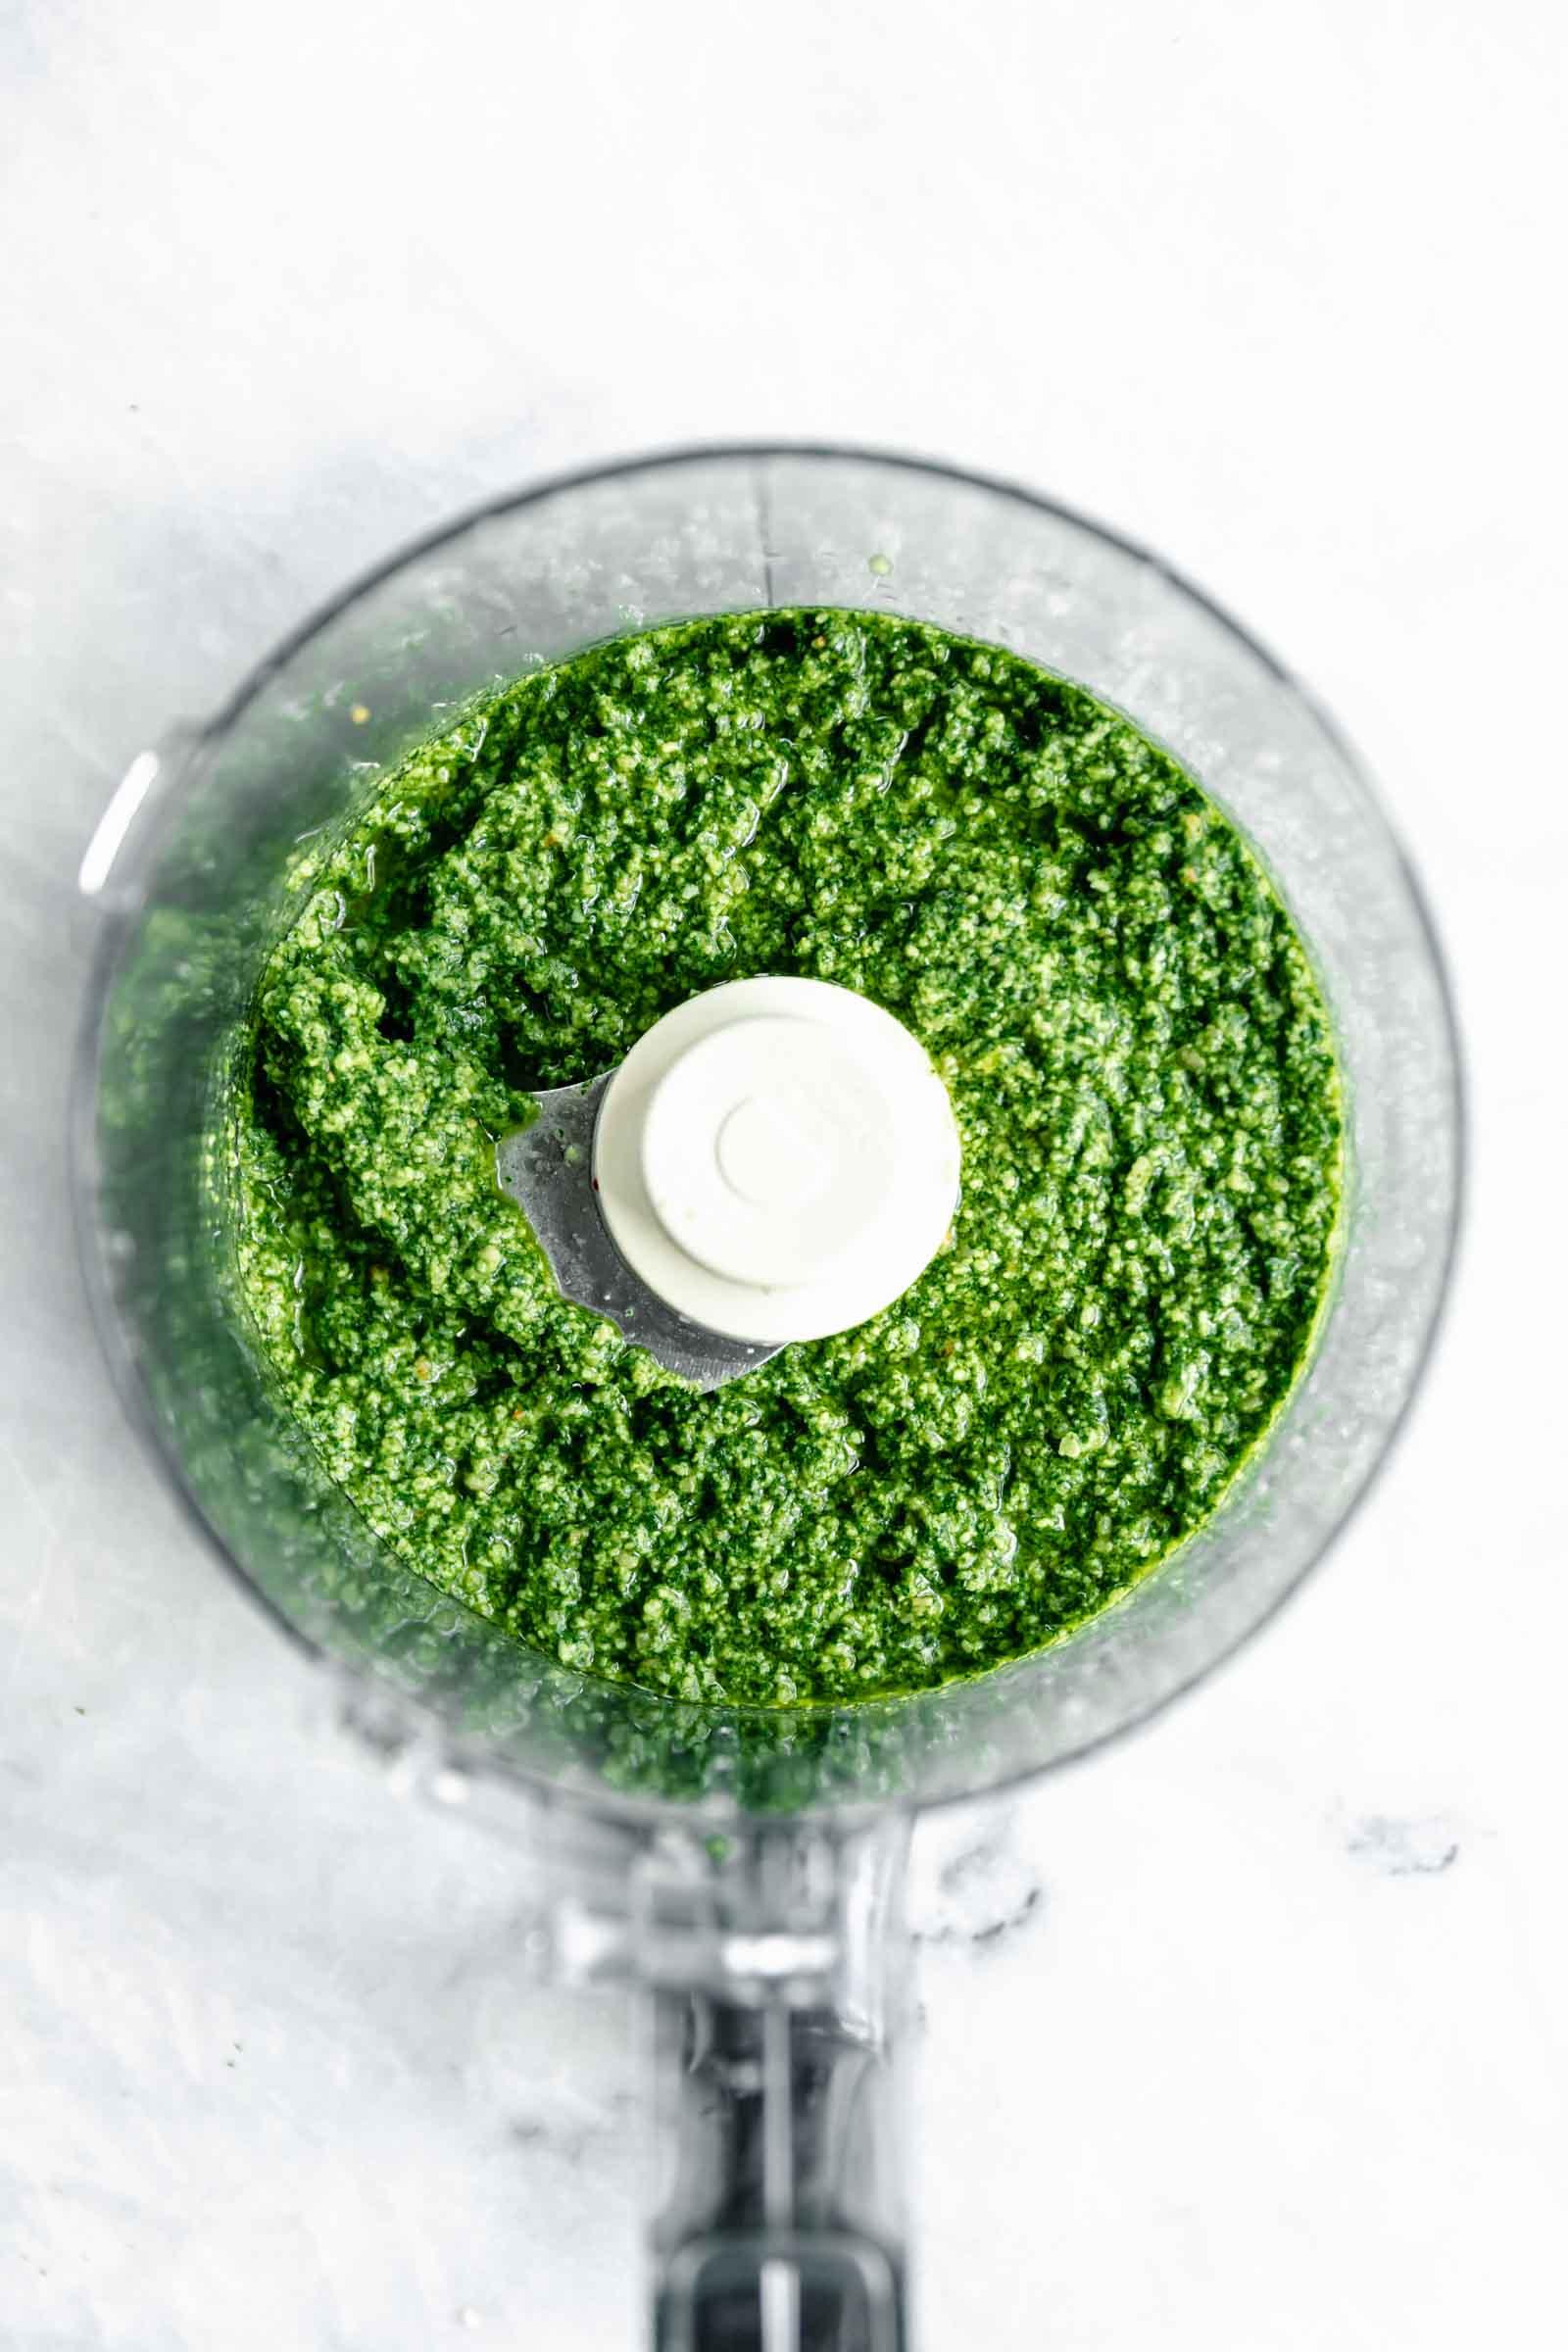 pesto process shot in food processor